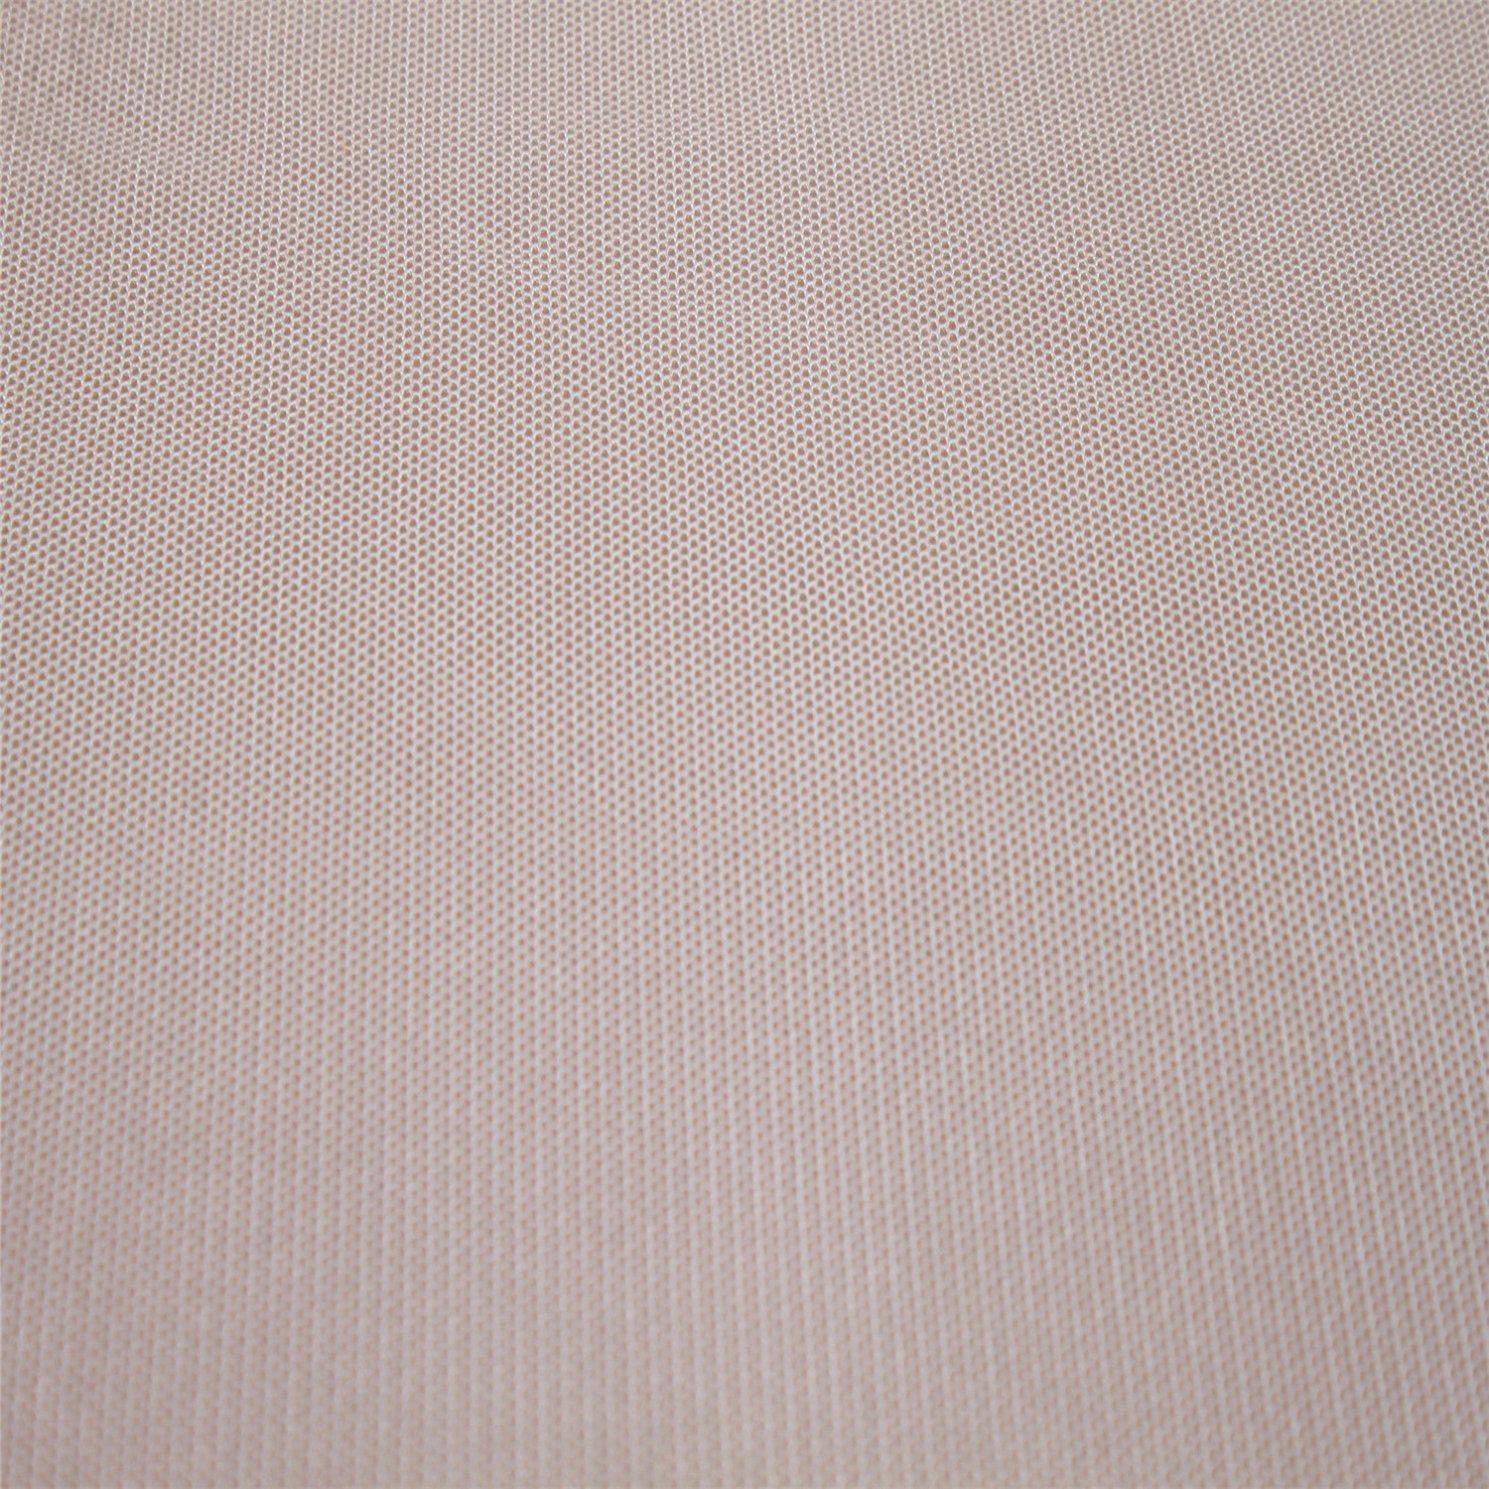 Althletic Wear Light Wight Mesh Fabric